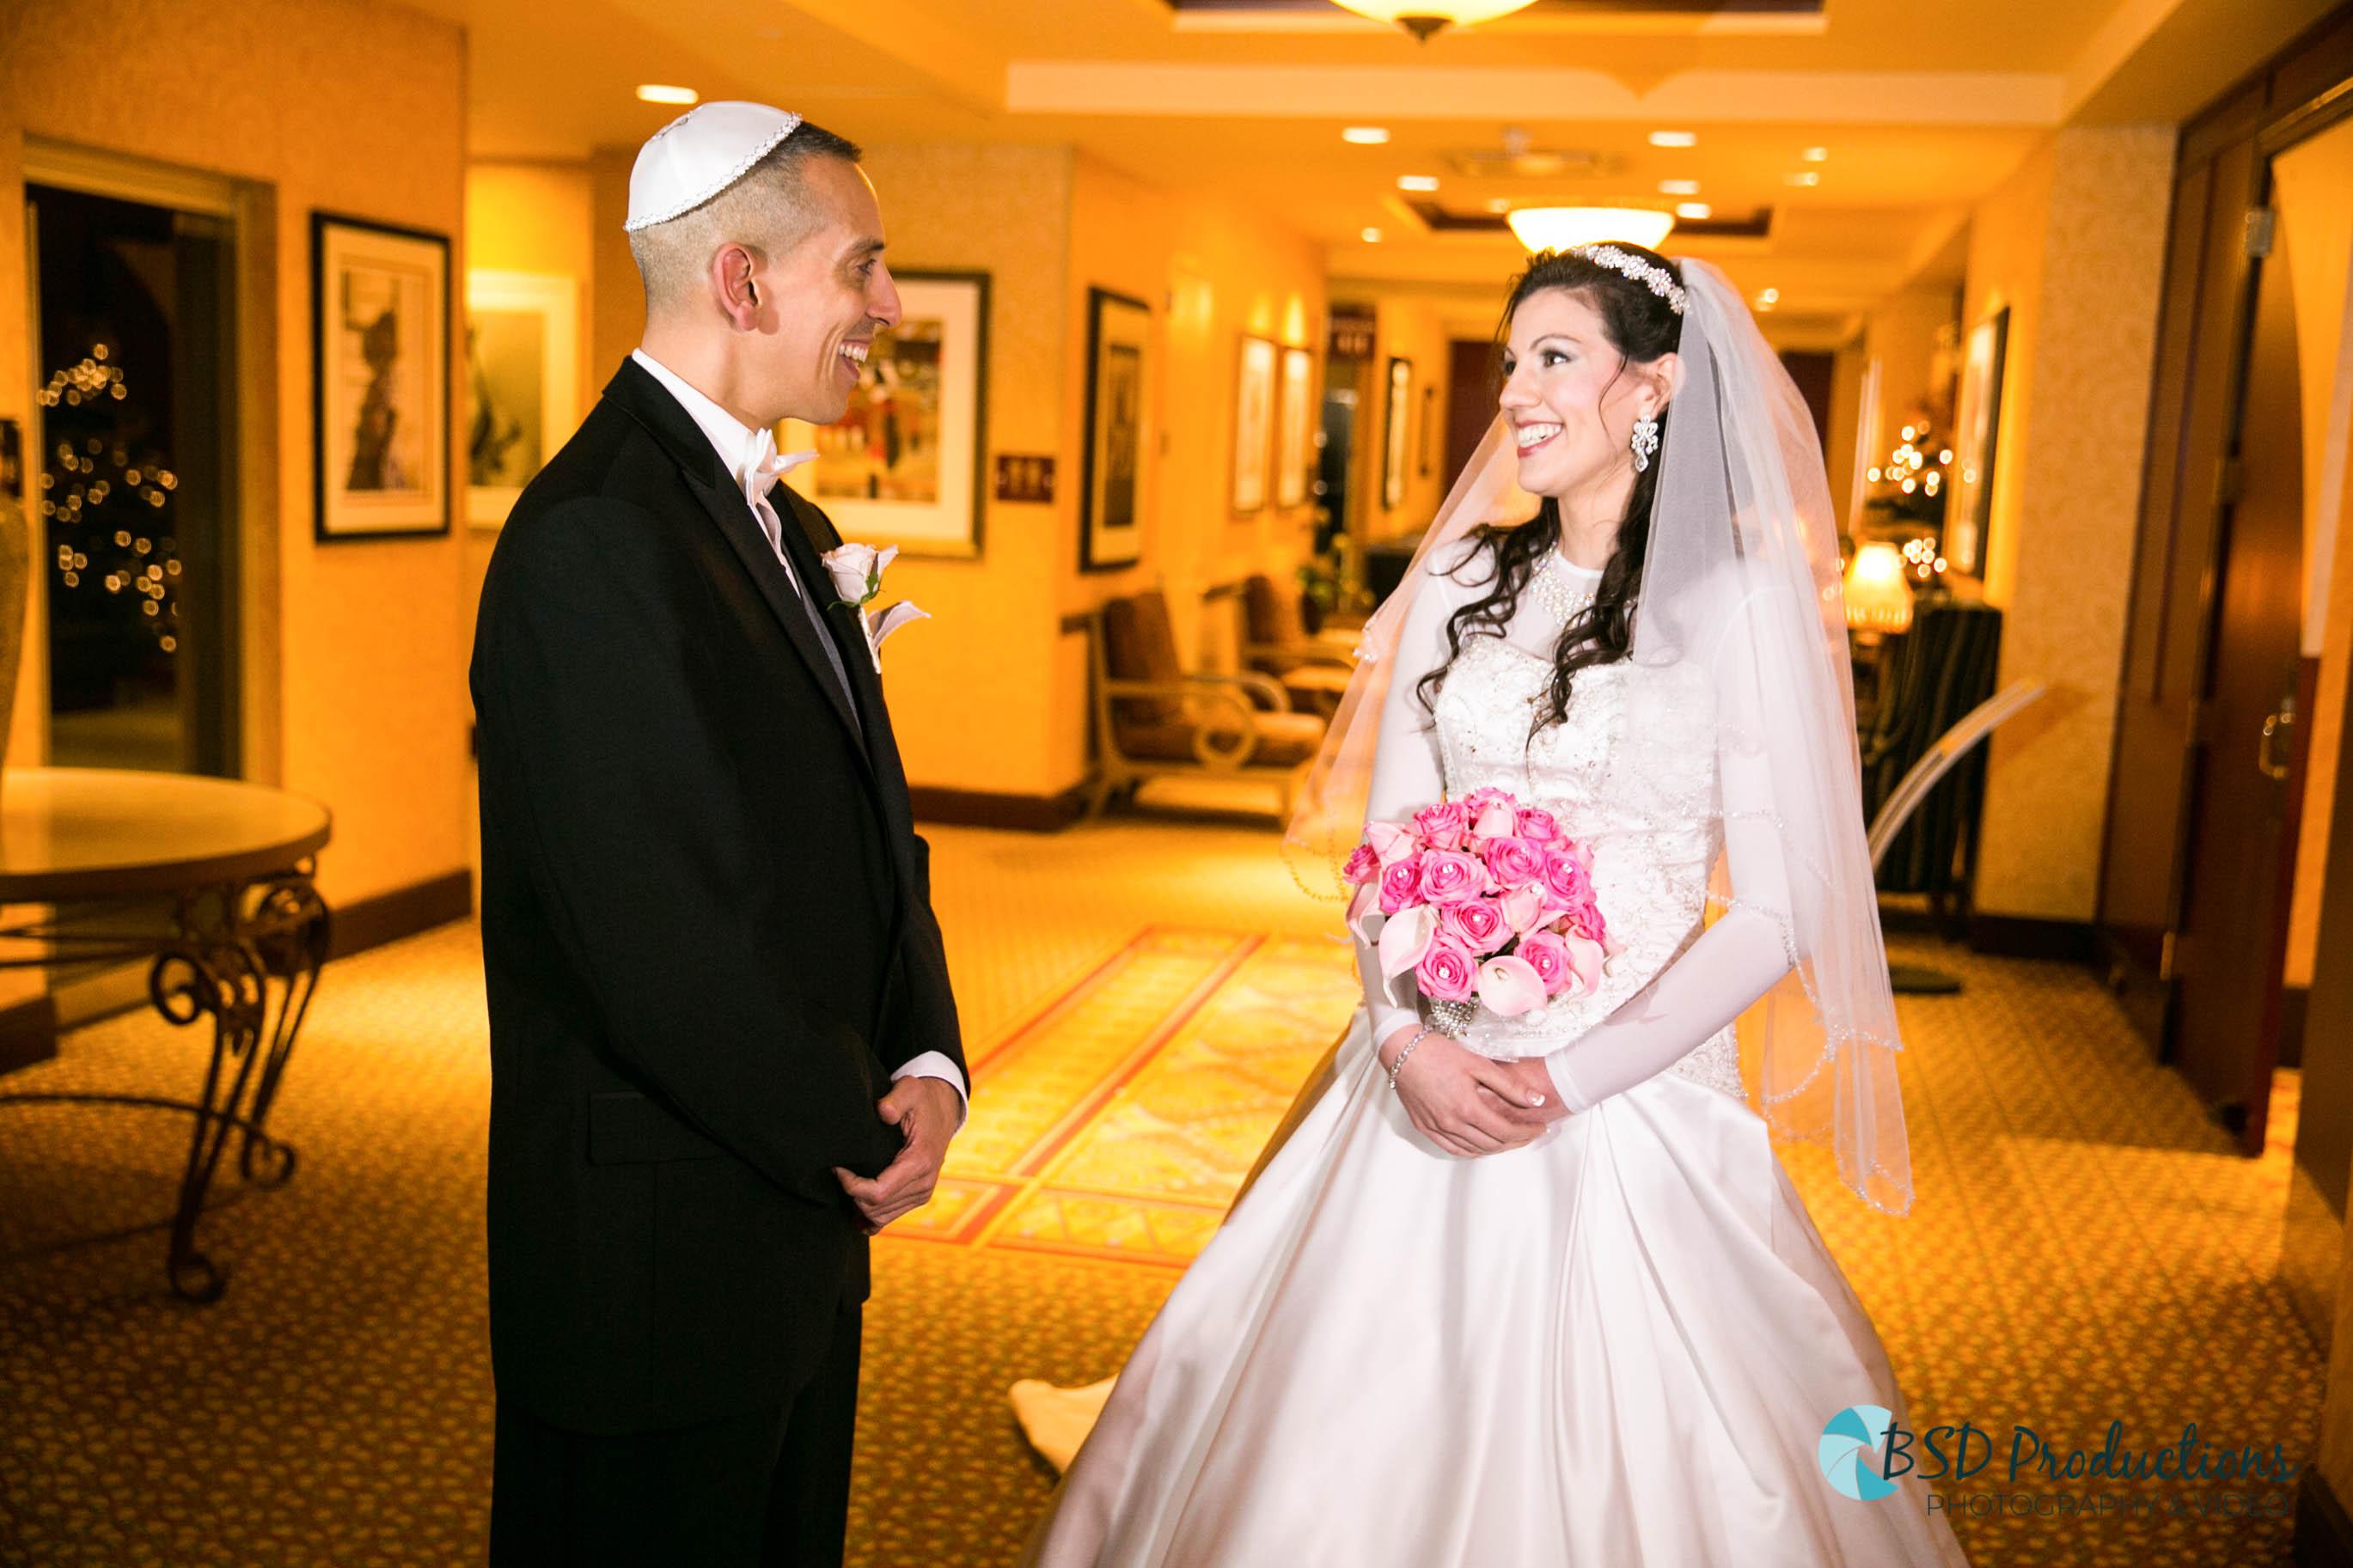 D_R_9778 Wedding – BSD Productions Photography